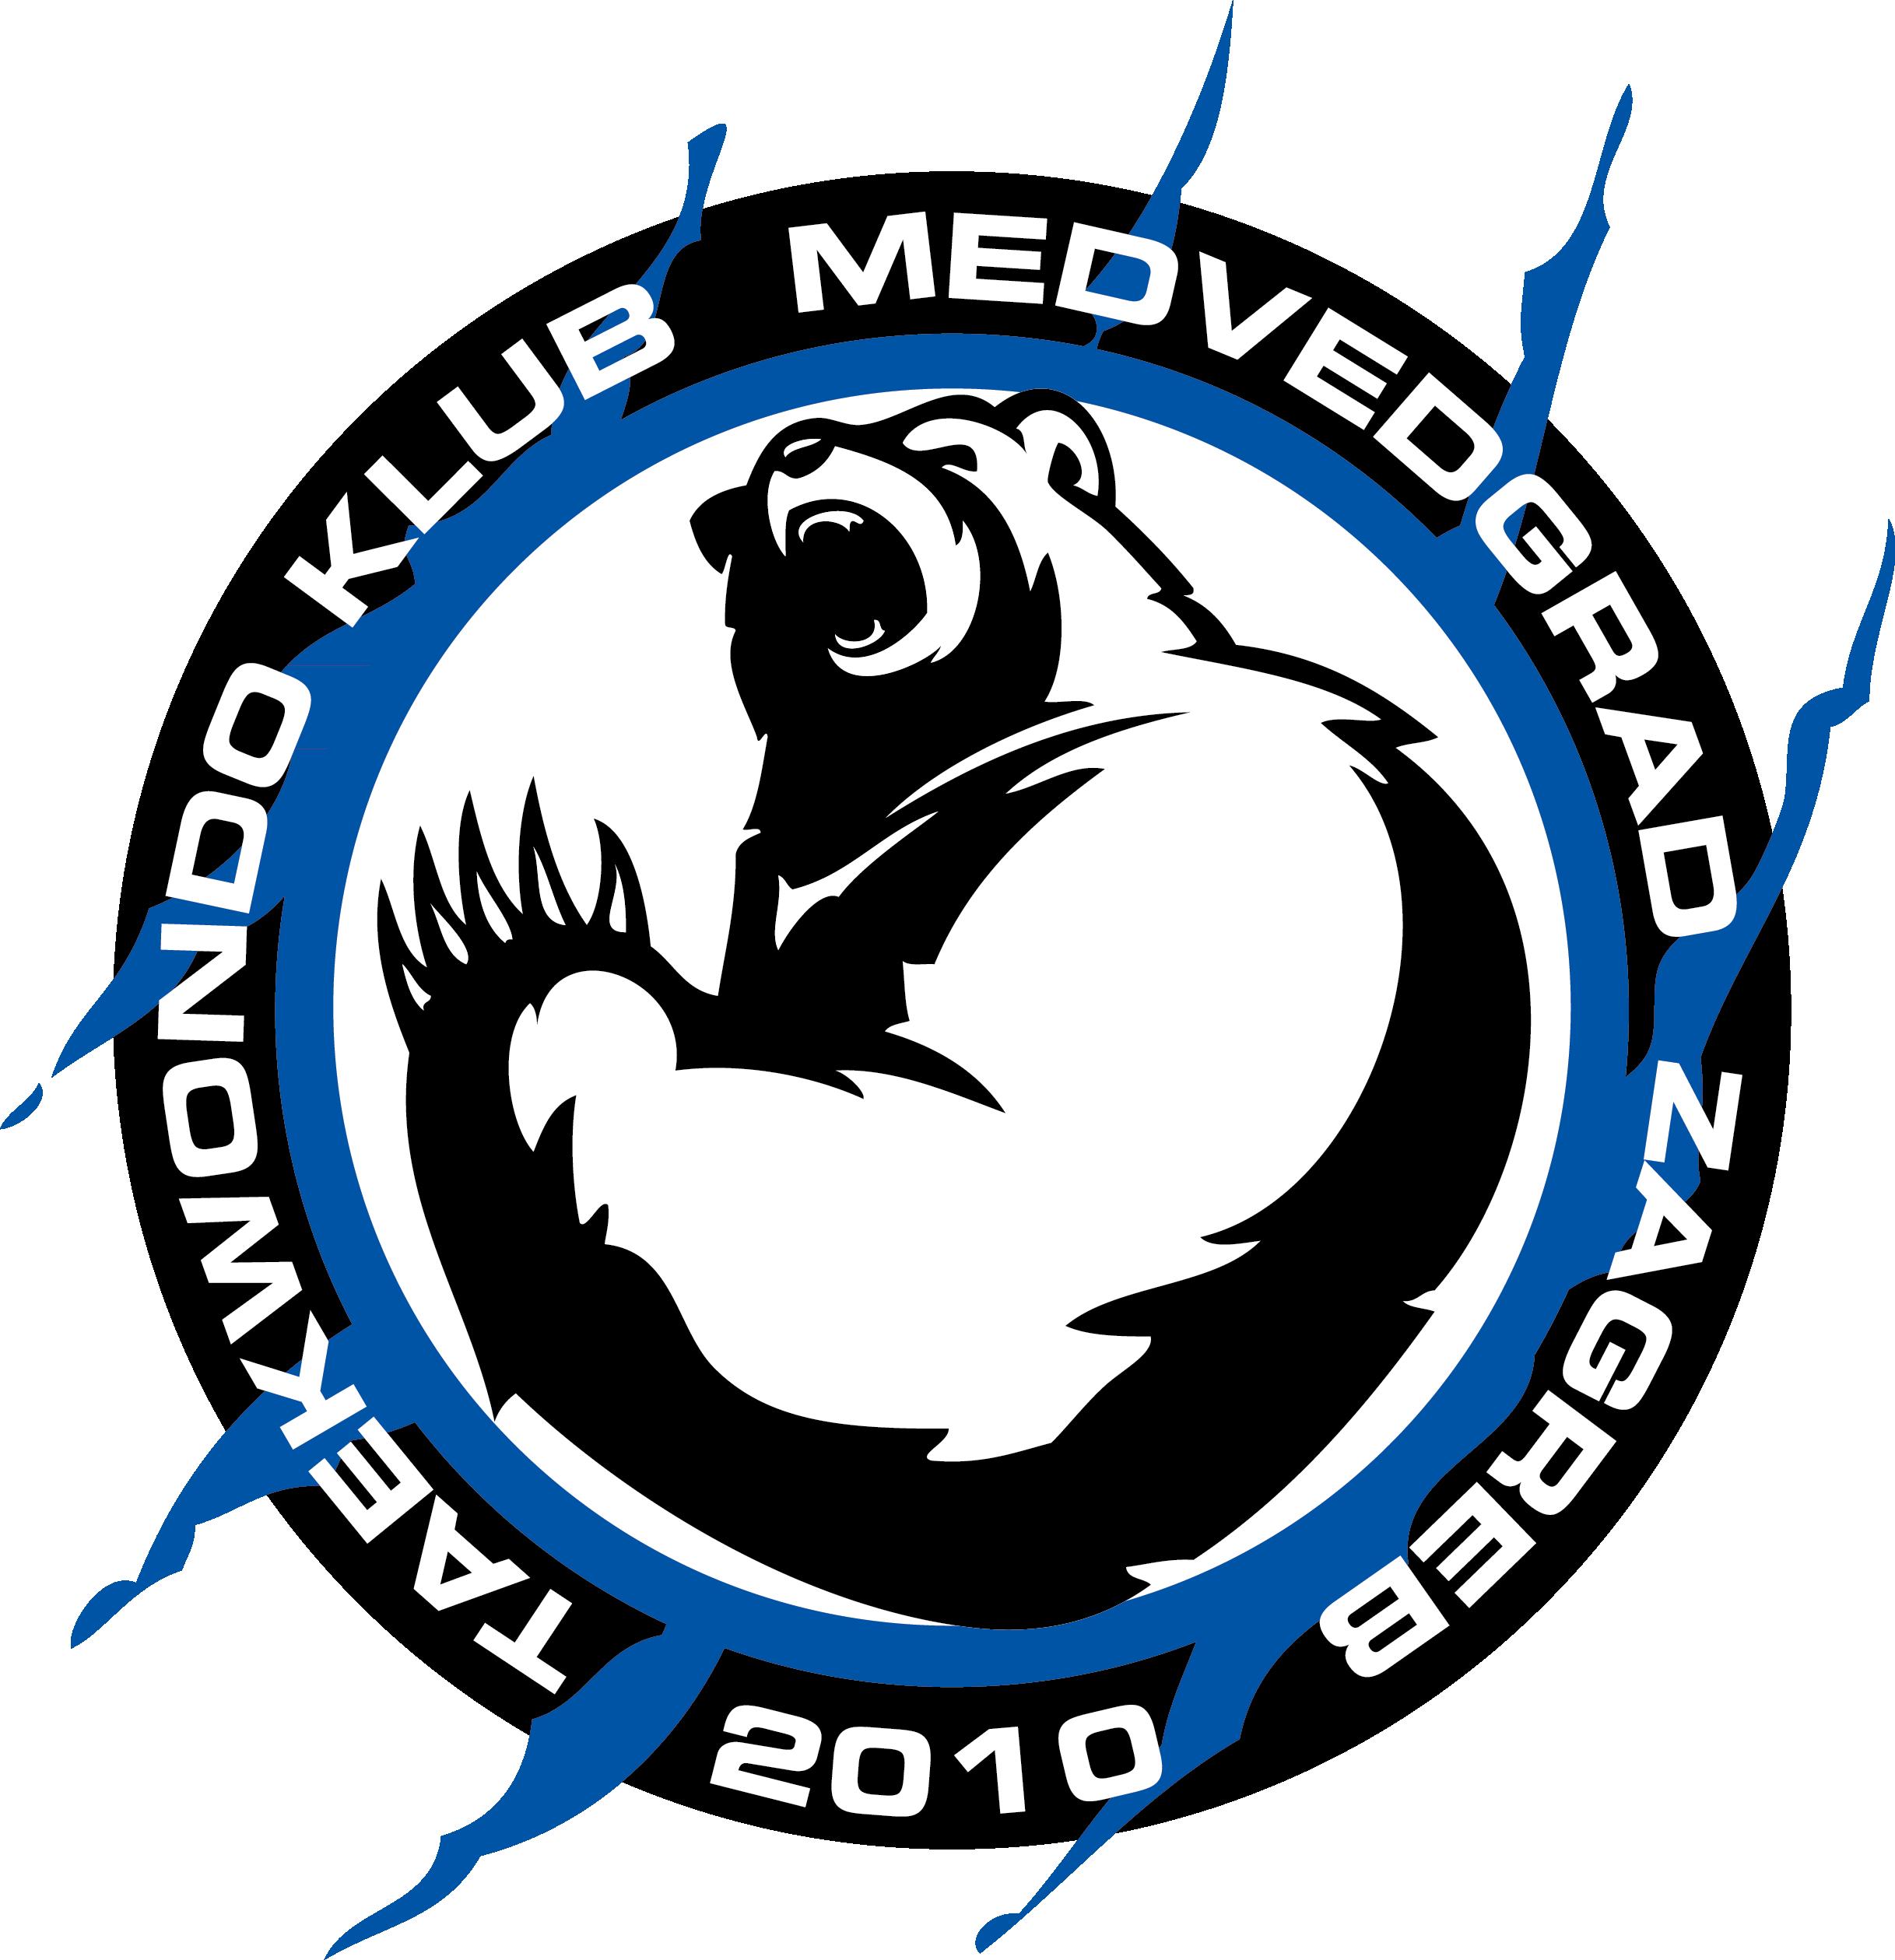 grb kluba